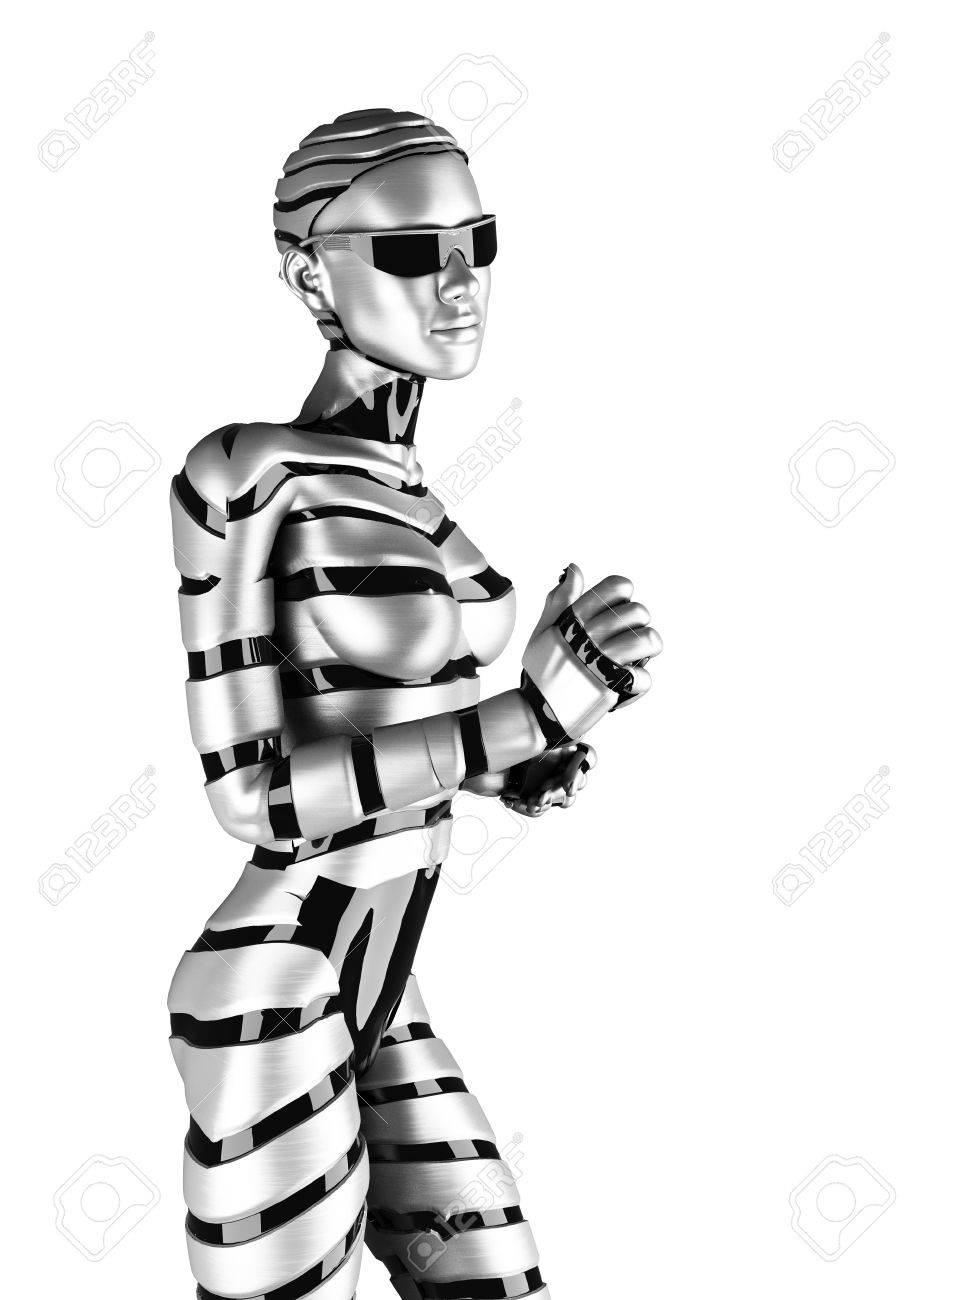 робот женщина фото